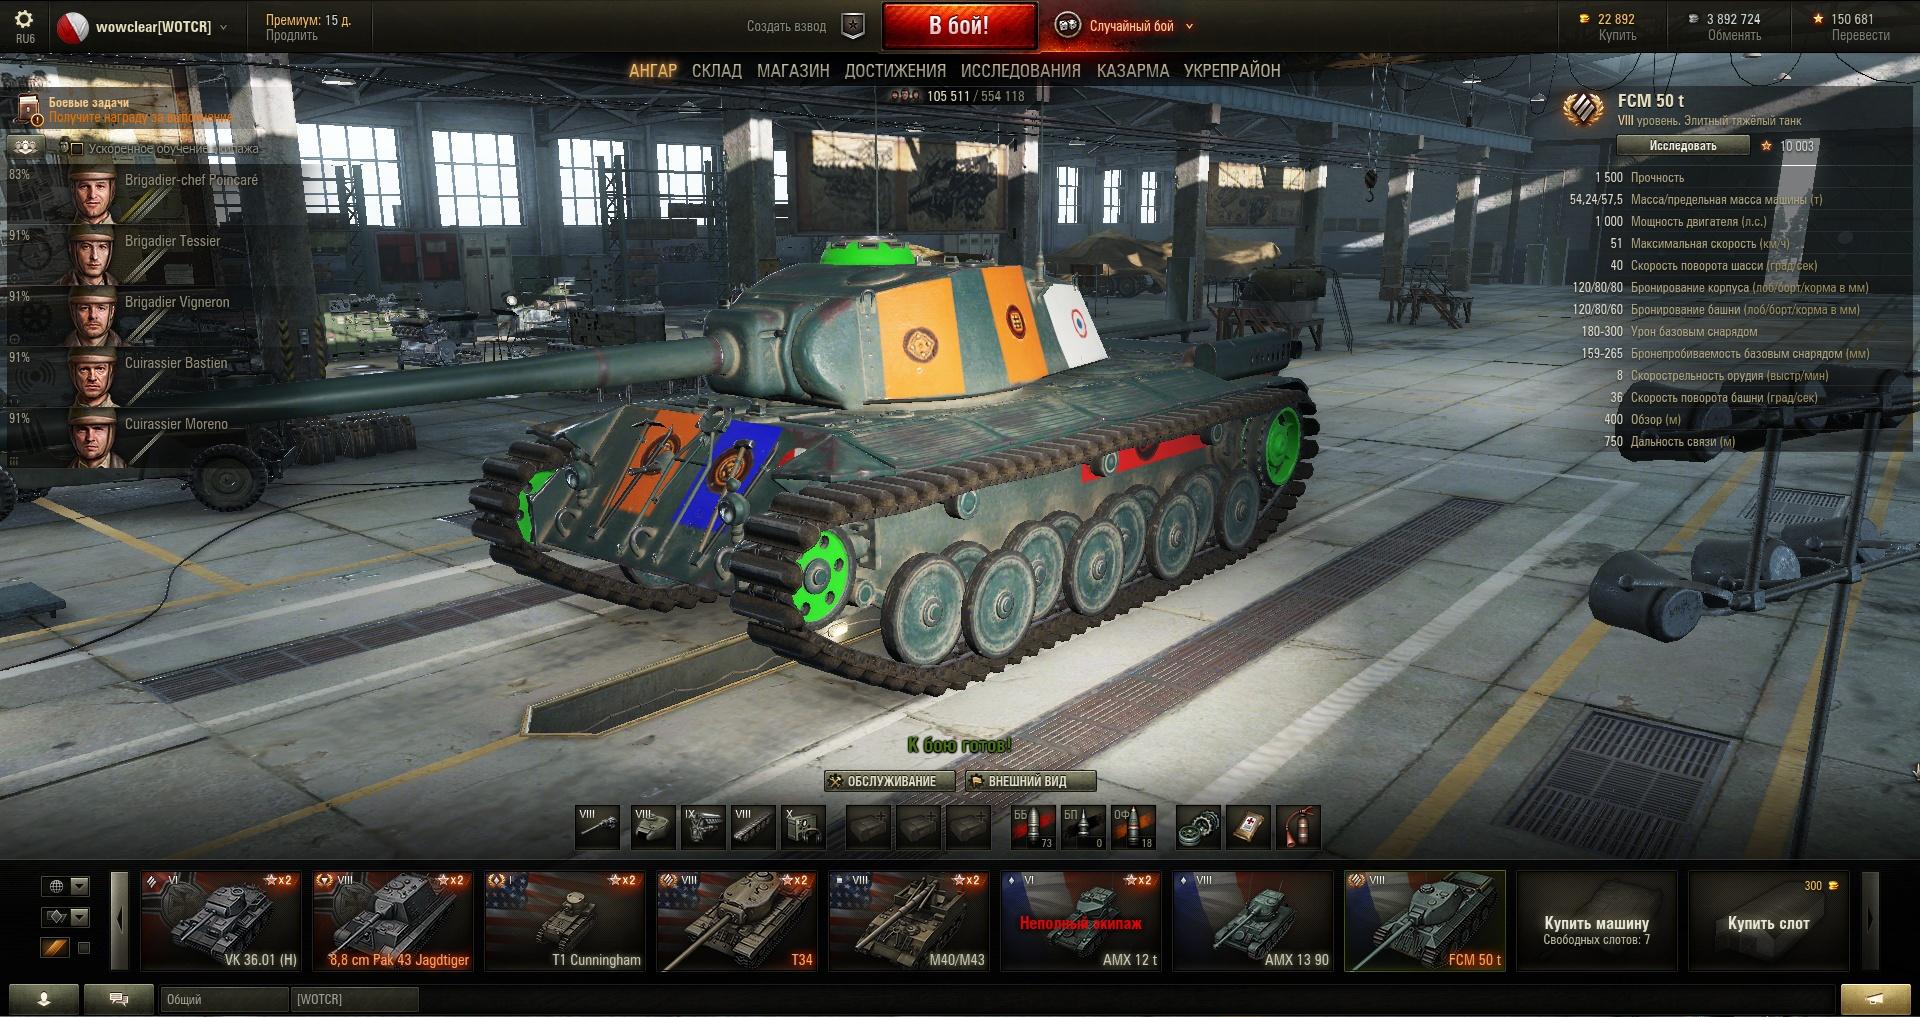 Скачать моды на танки от протанки